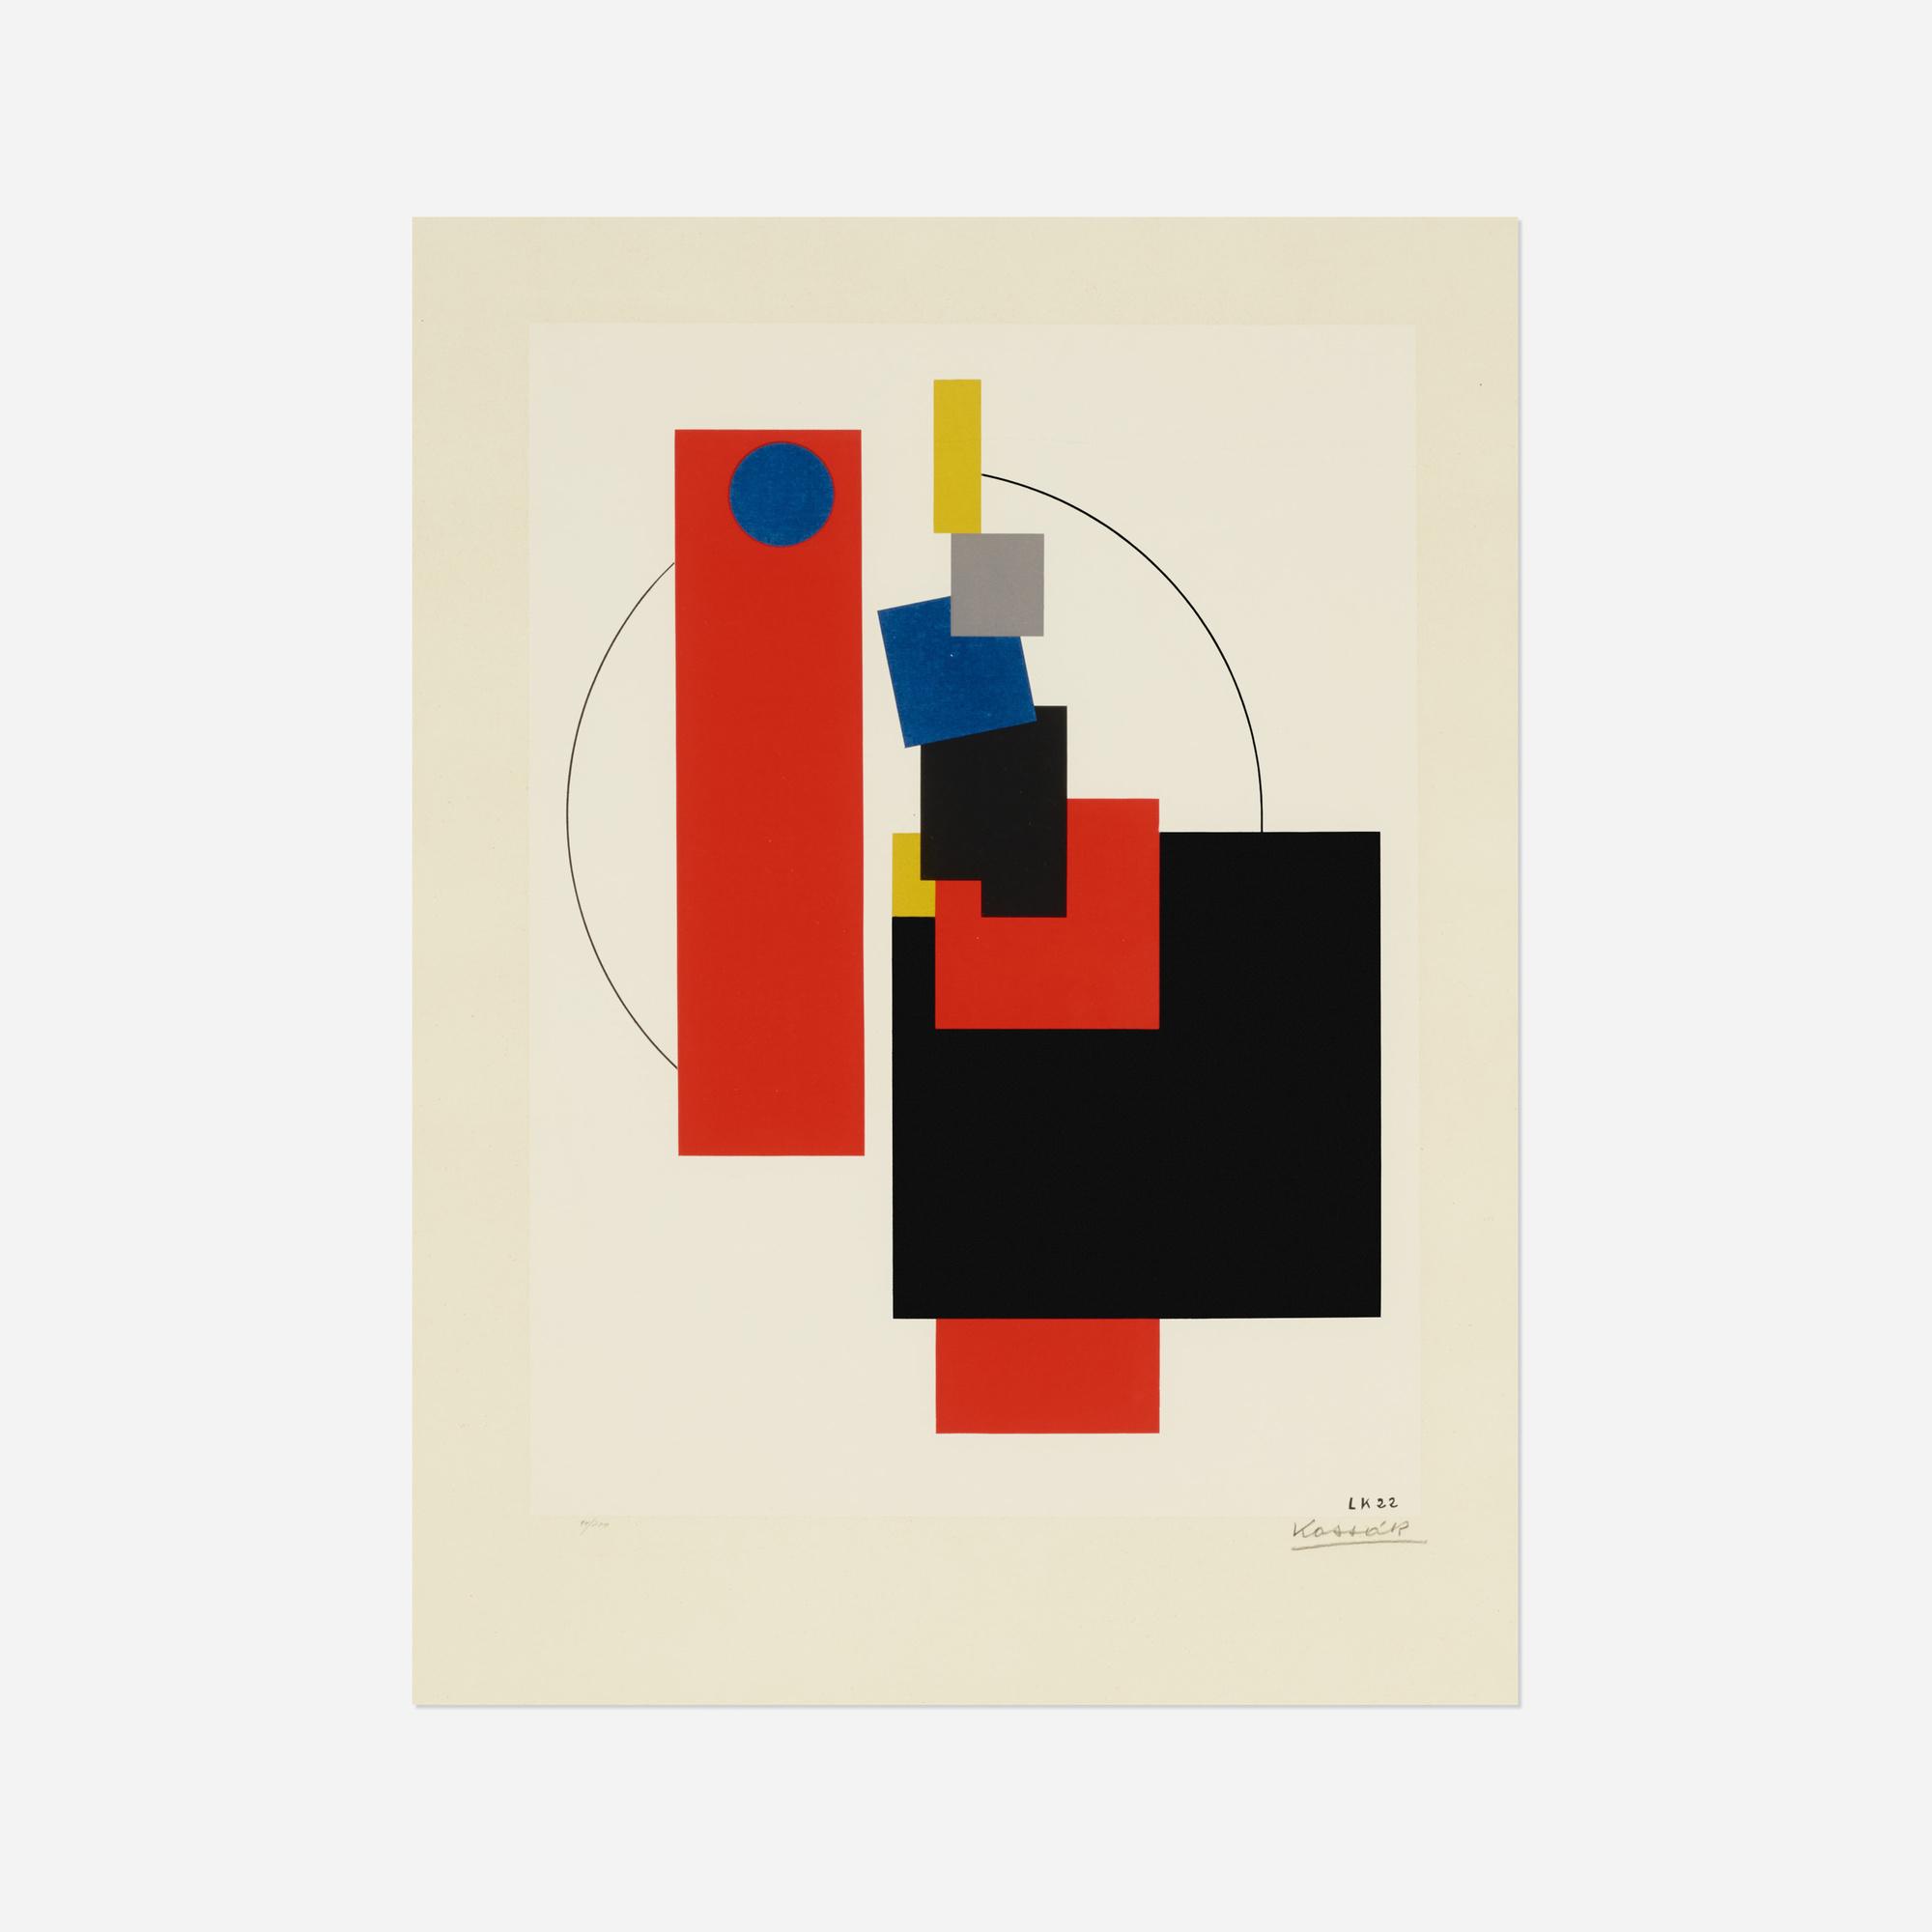 191: Lajos Kassak / Untitled (from the Bildarchitectur portfolio) (1 of 2)